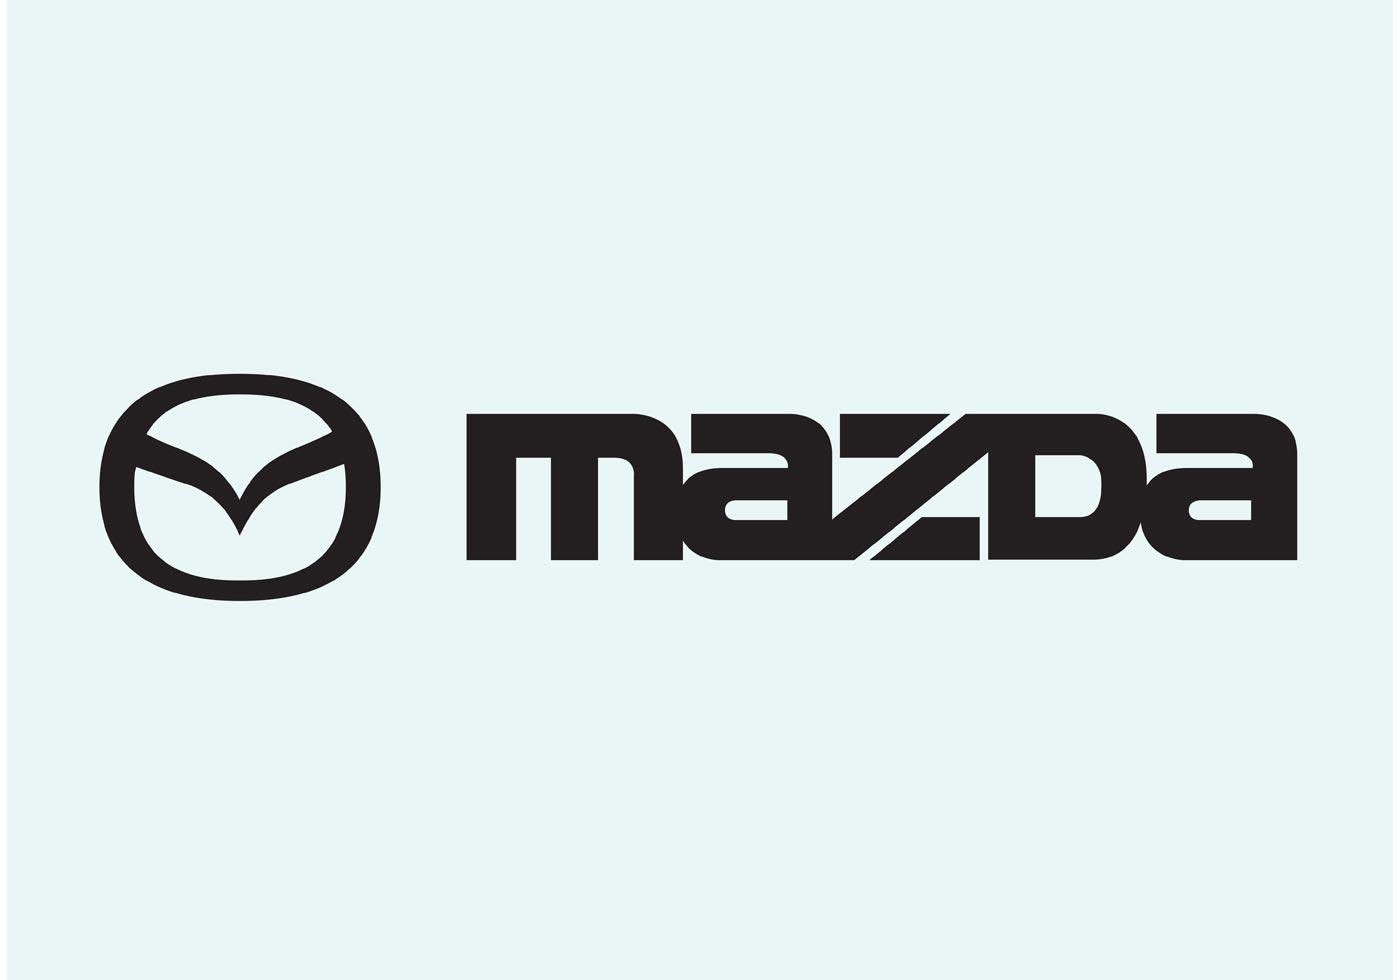 mazda free vector art 2707 free downloads rh vecteezy com mazda cx-5 logo vector mazda logo vector free download